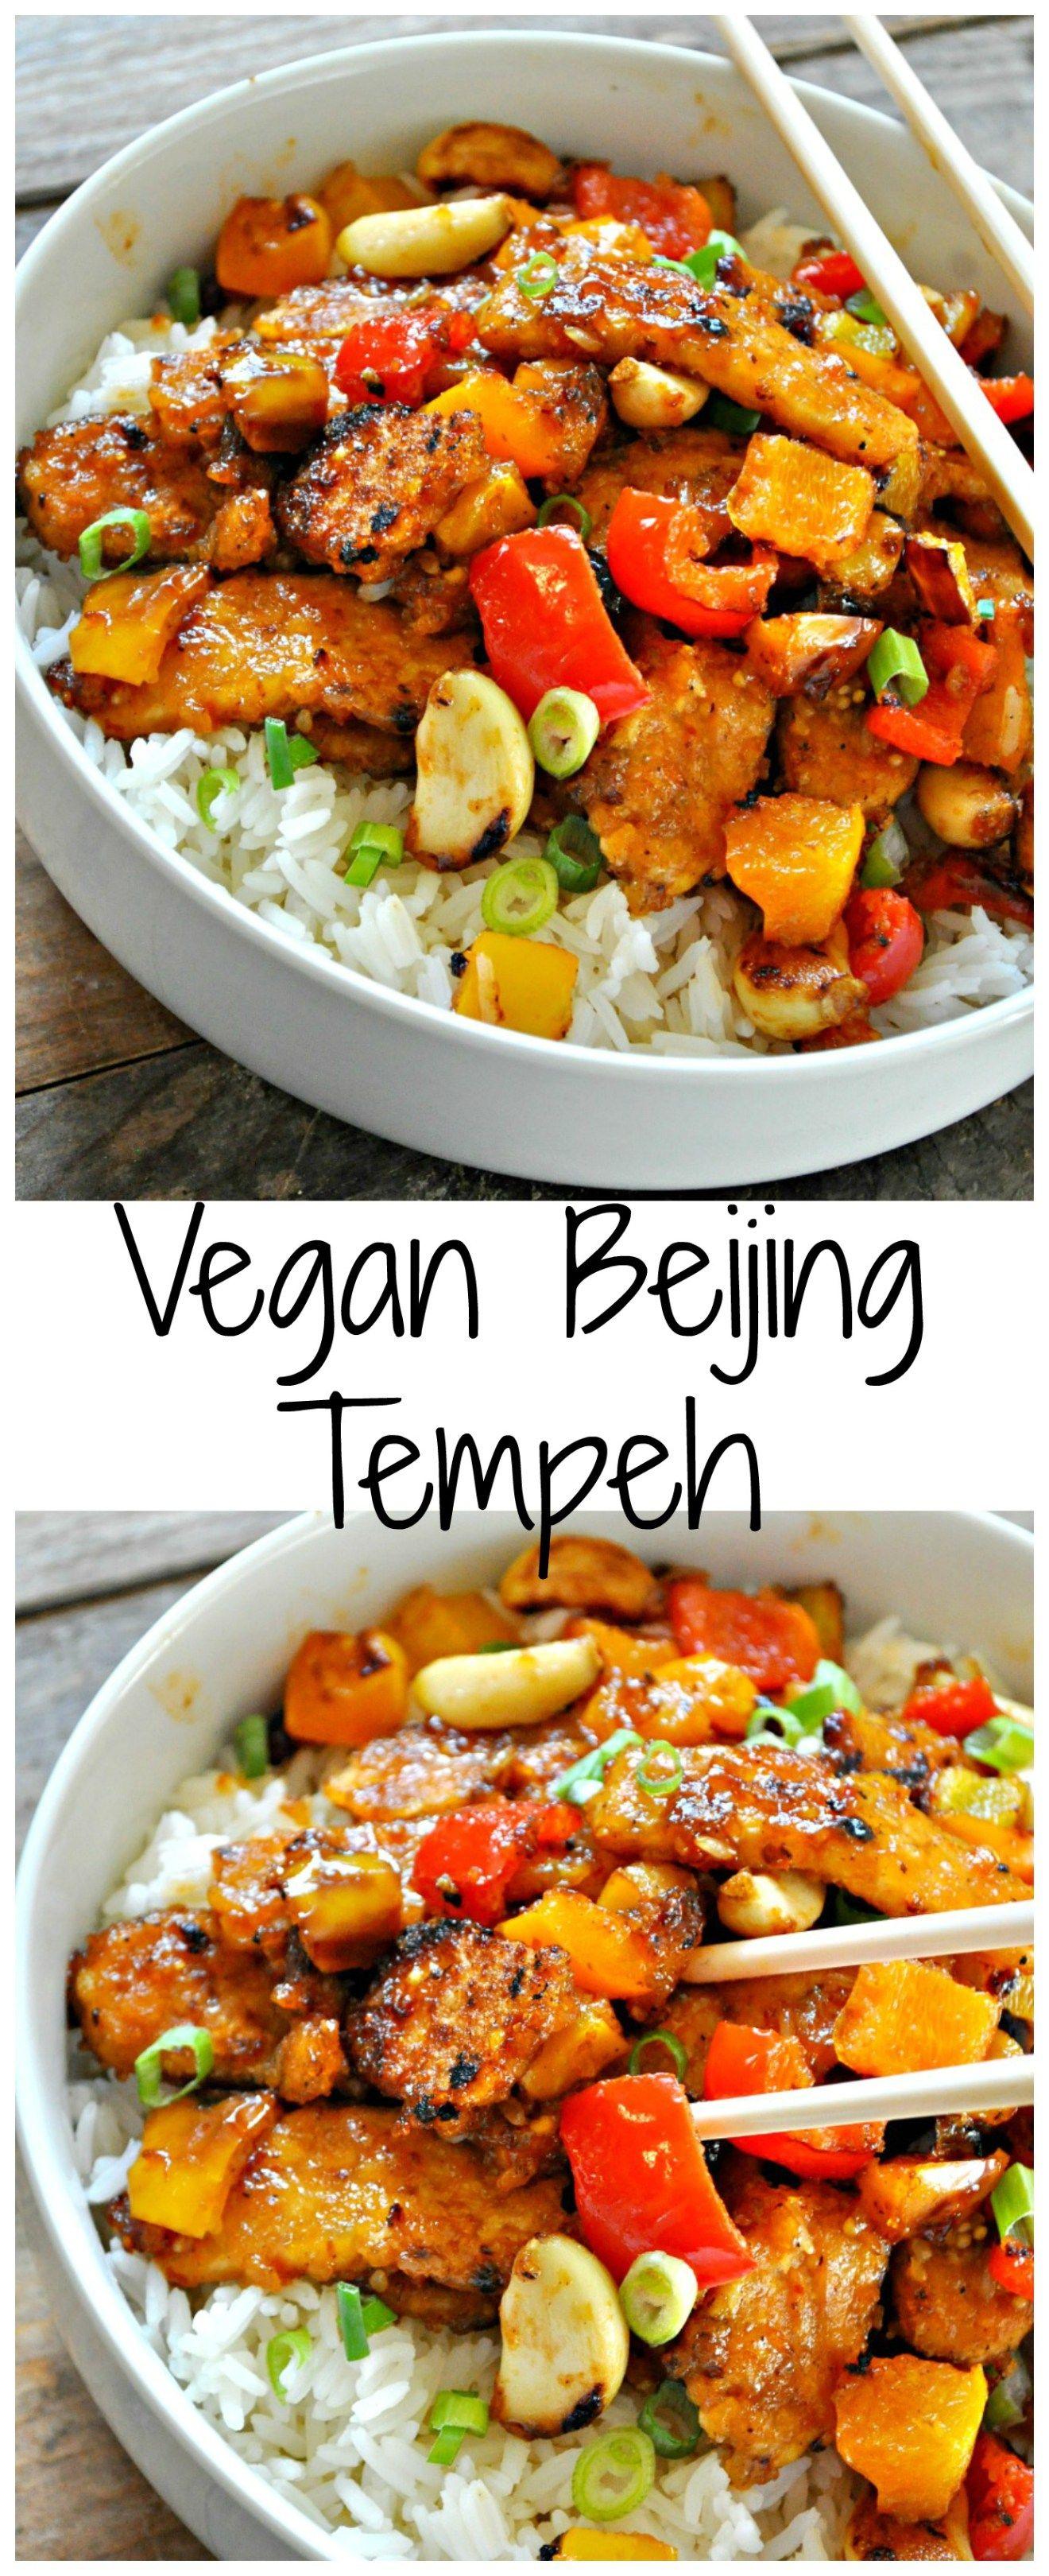 Vegan Beijing Tempeh Recipe Vegan Dinner Recipes Vegan Dinners Vegetarian Recipes